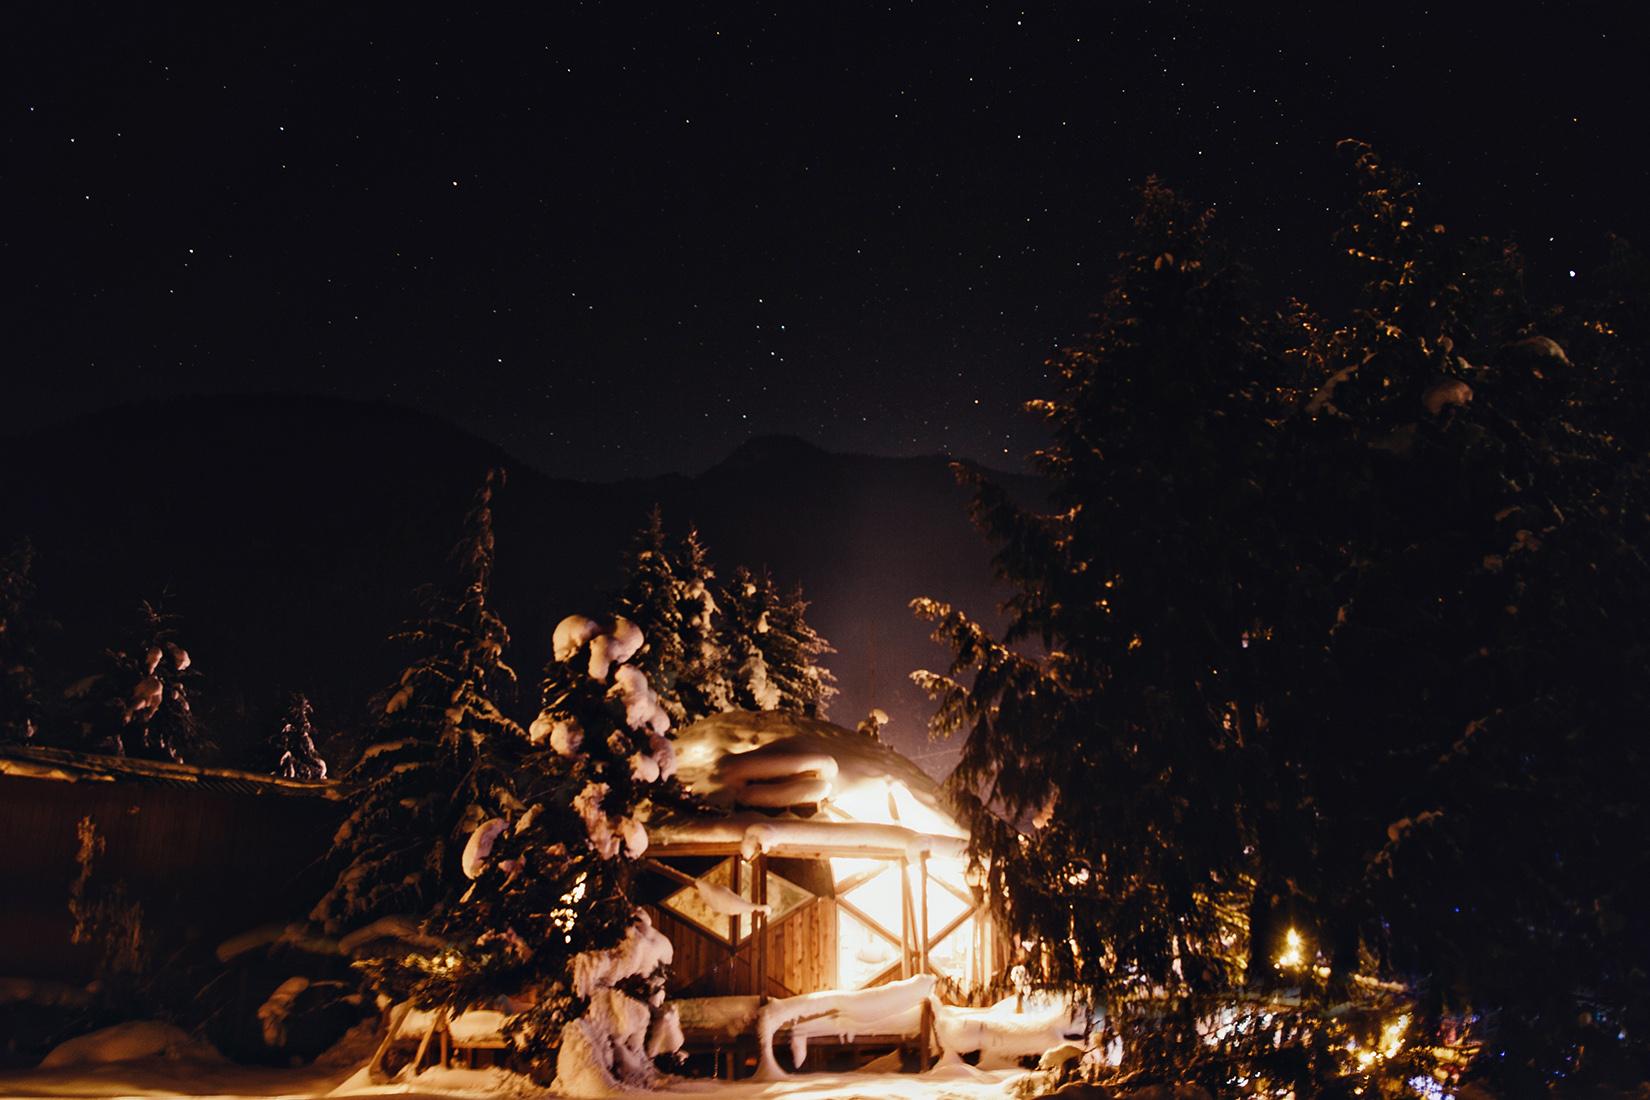 Cabin-New-Years-Night-Photography.jpg